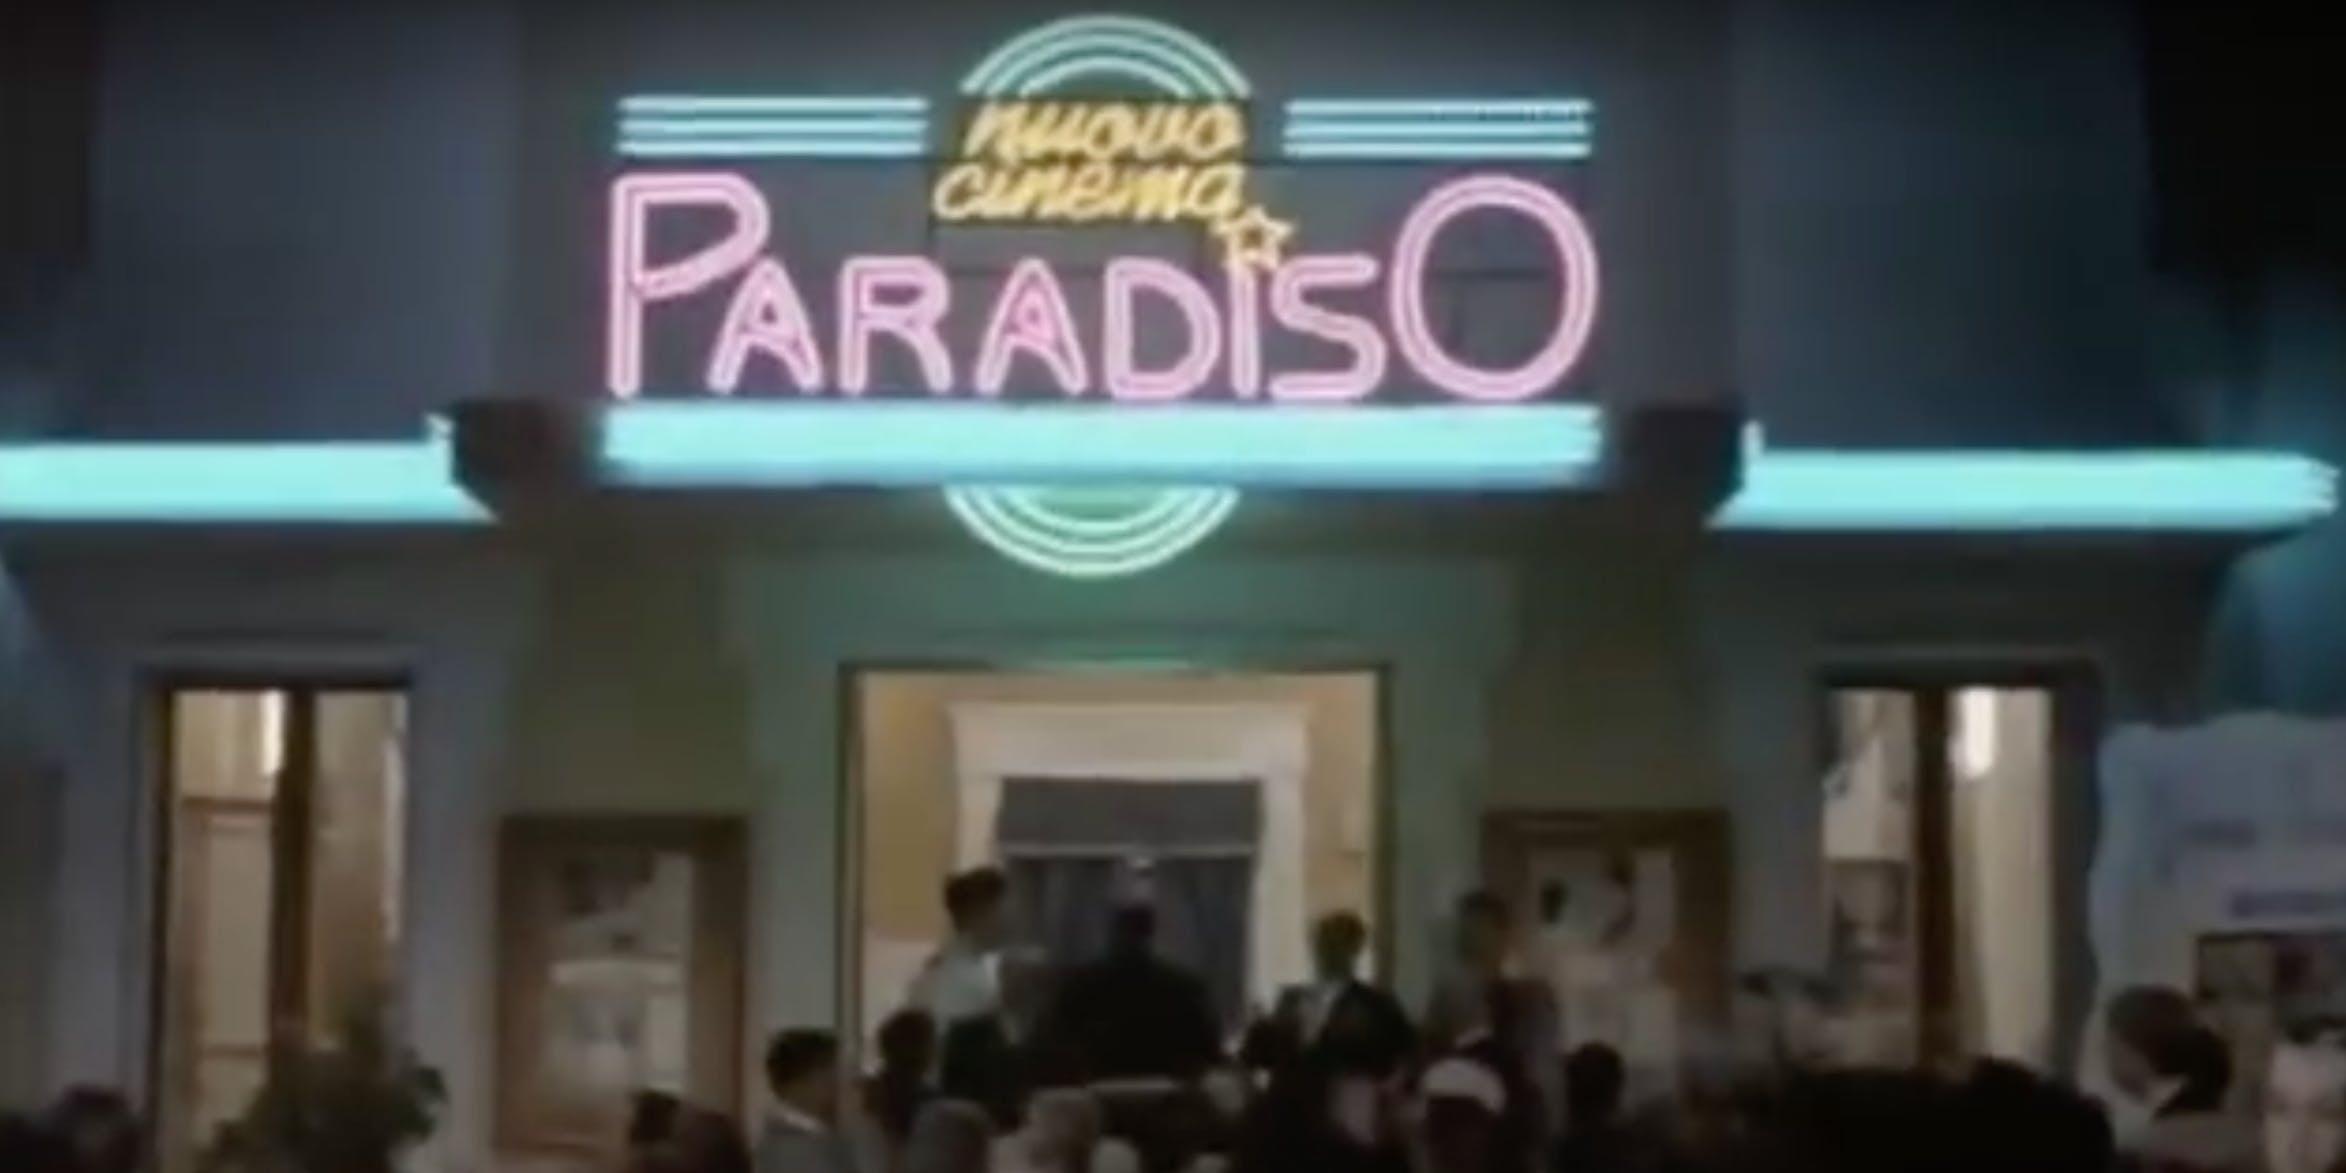 best classic Movies on Netflix: Cinema Paradiso